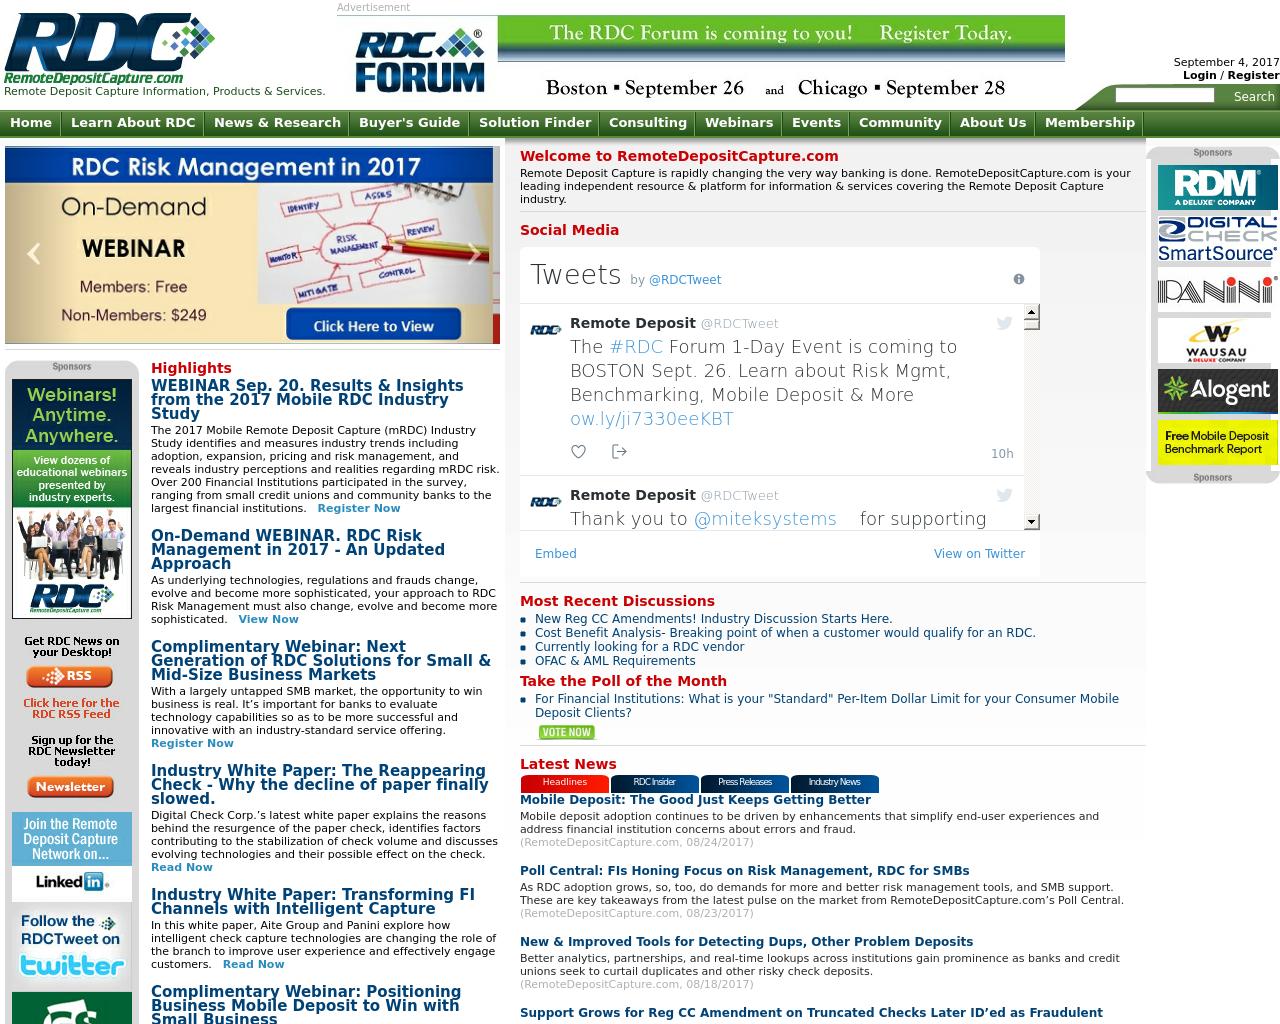 Remote-Deposit-Capture-Advertising-Reviews-Pricing